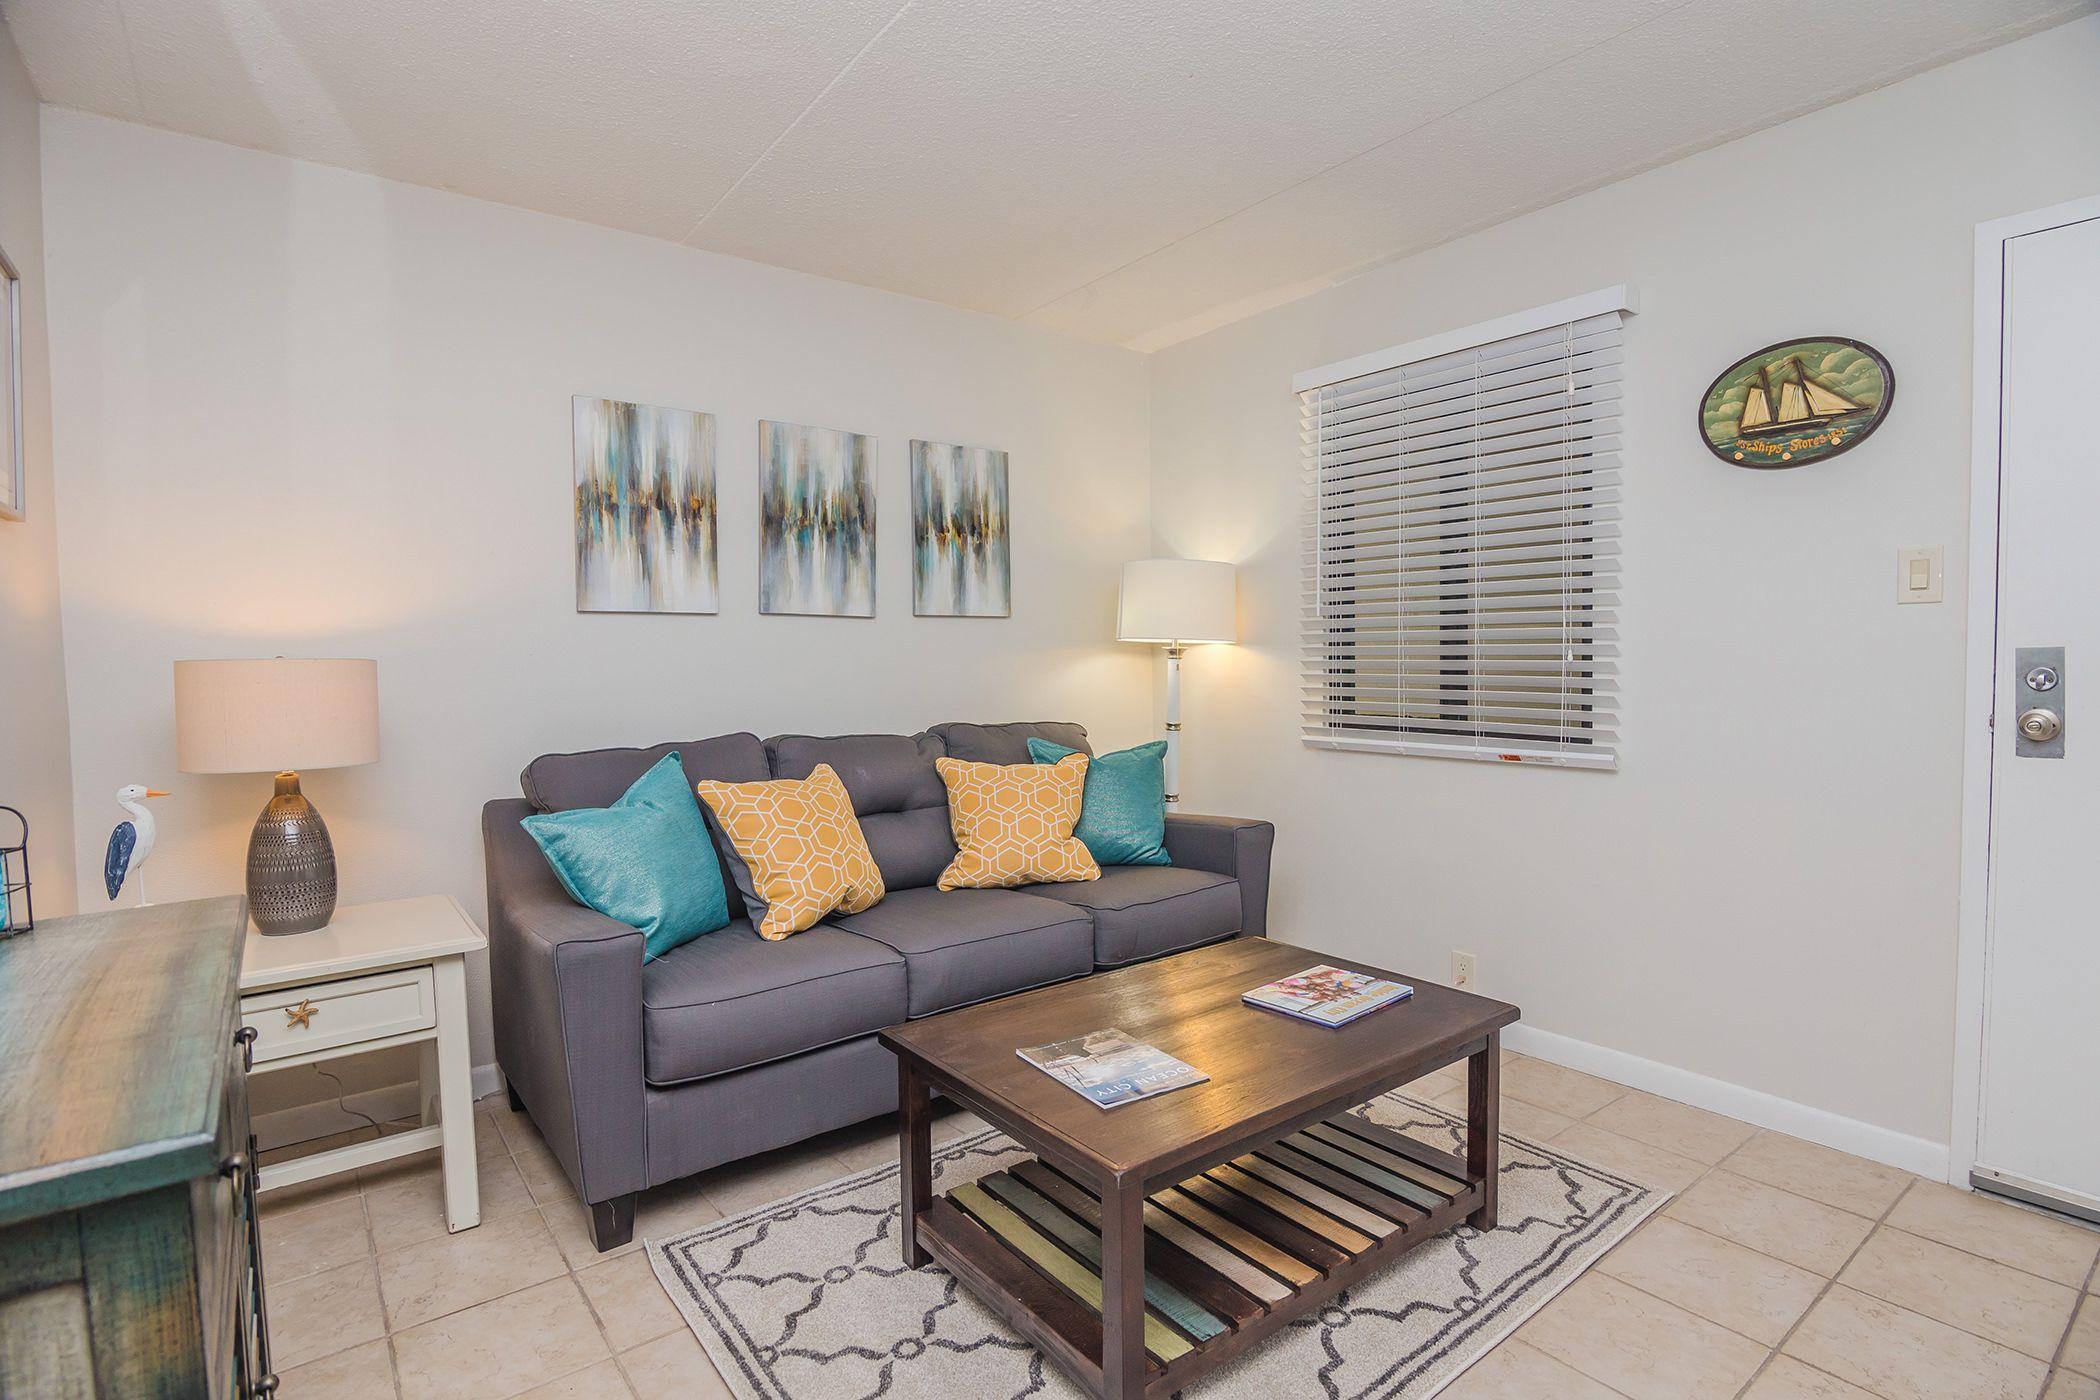 Den Third Bedroom Or Second Living Room You Decide Living Room Sleep Sofa Bedroom